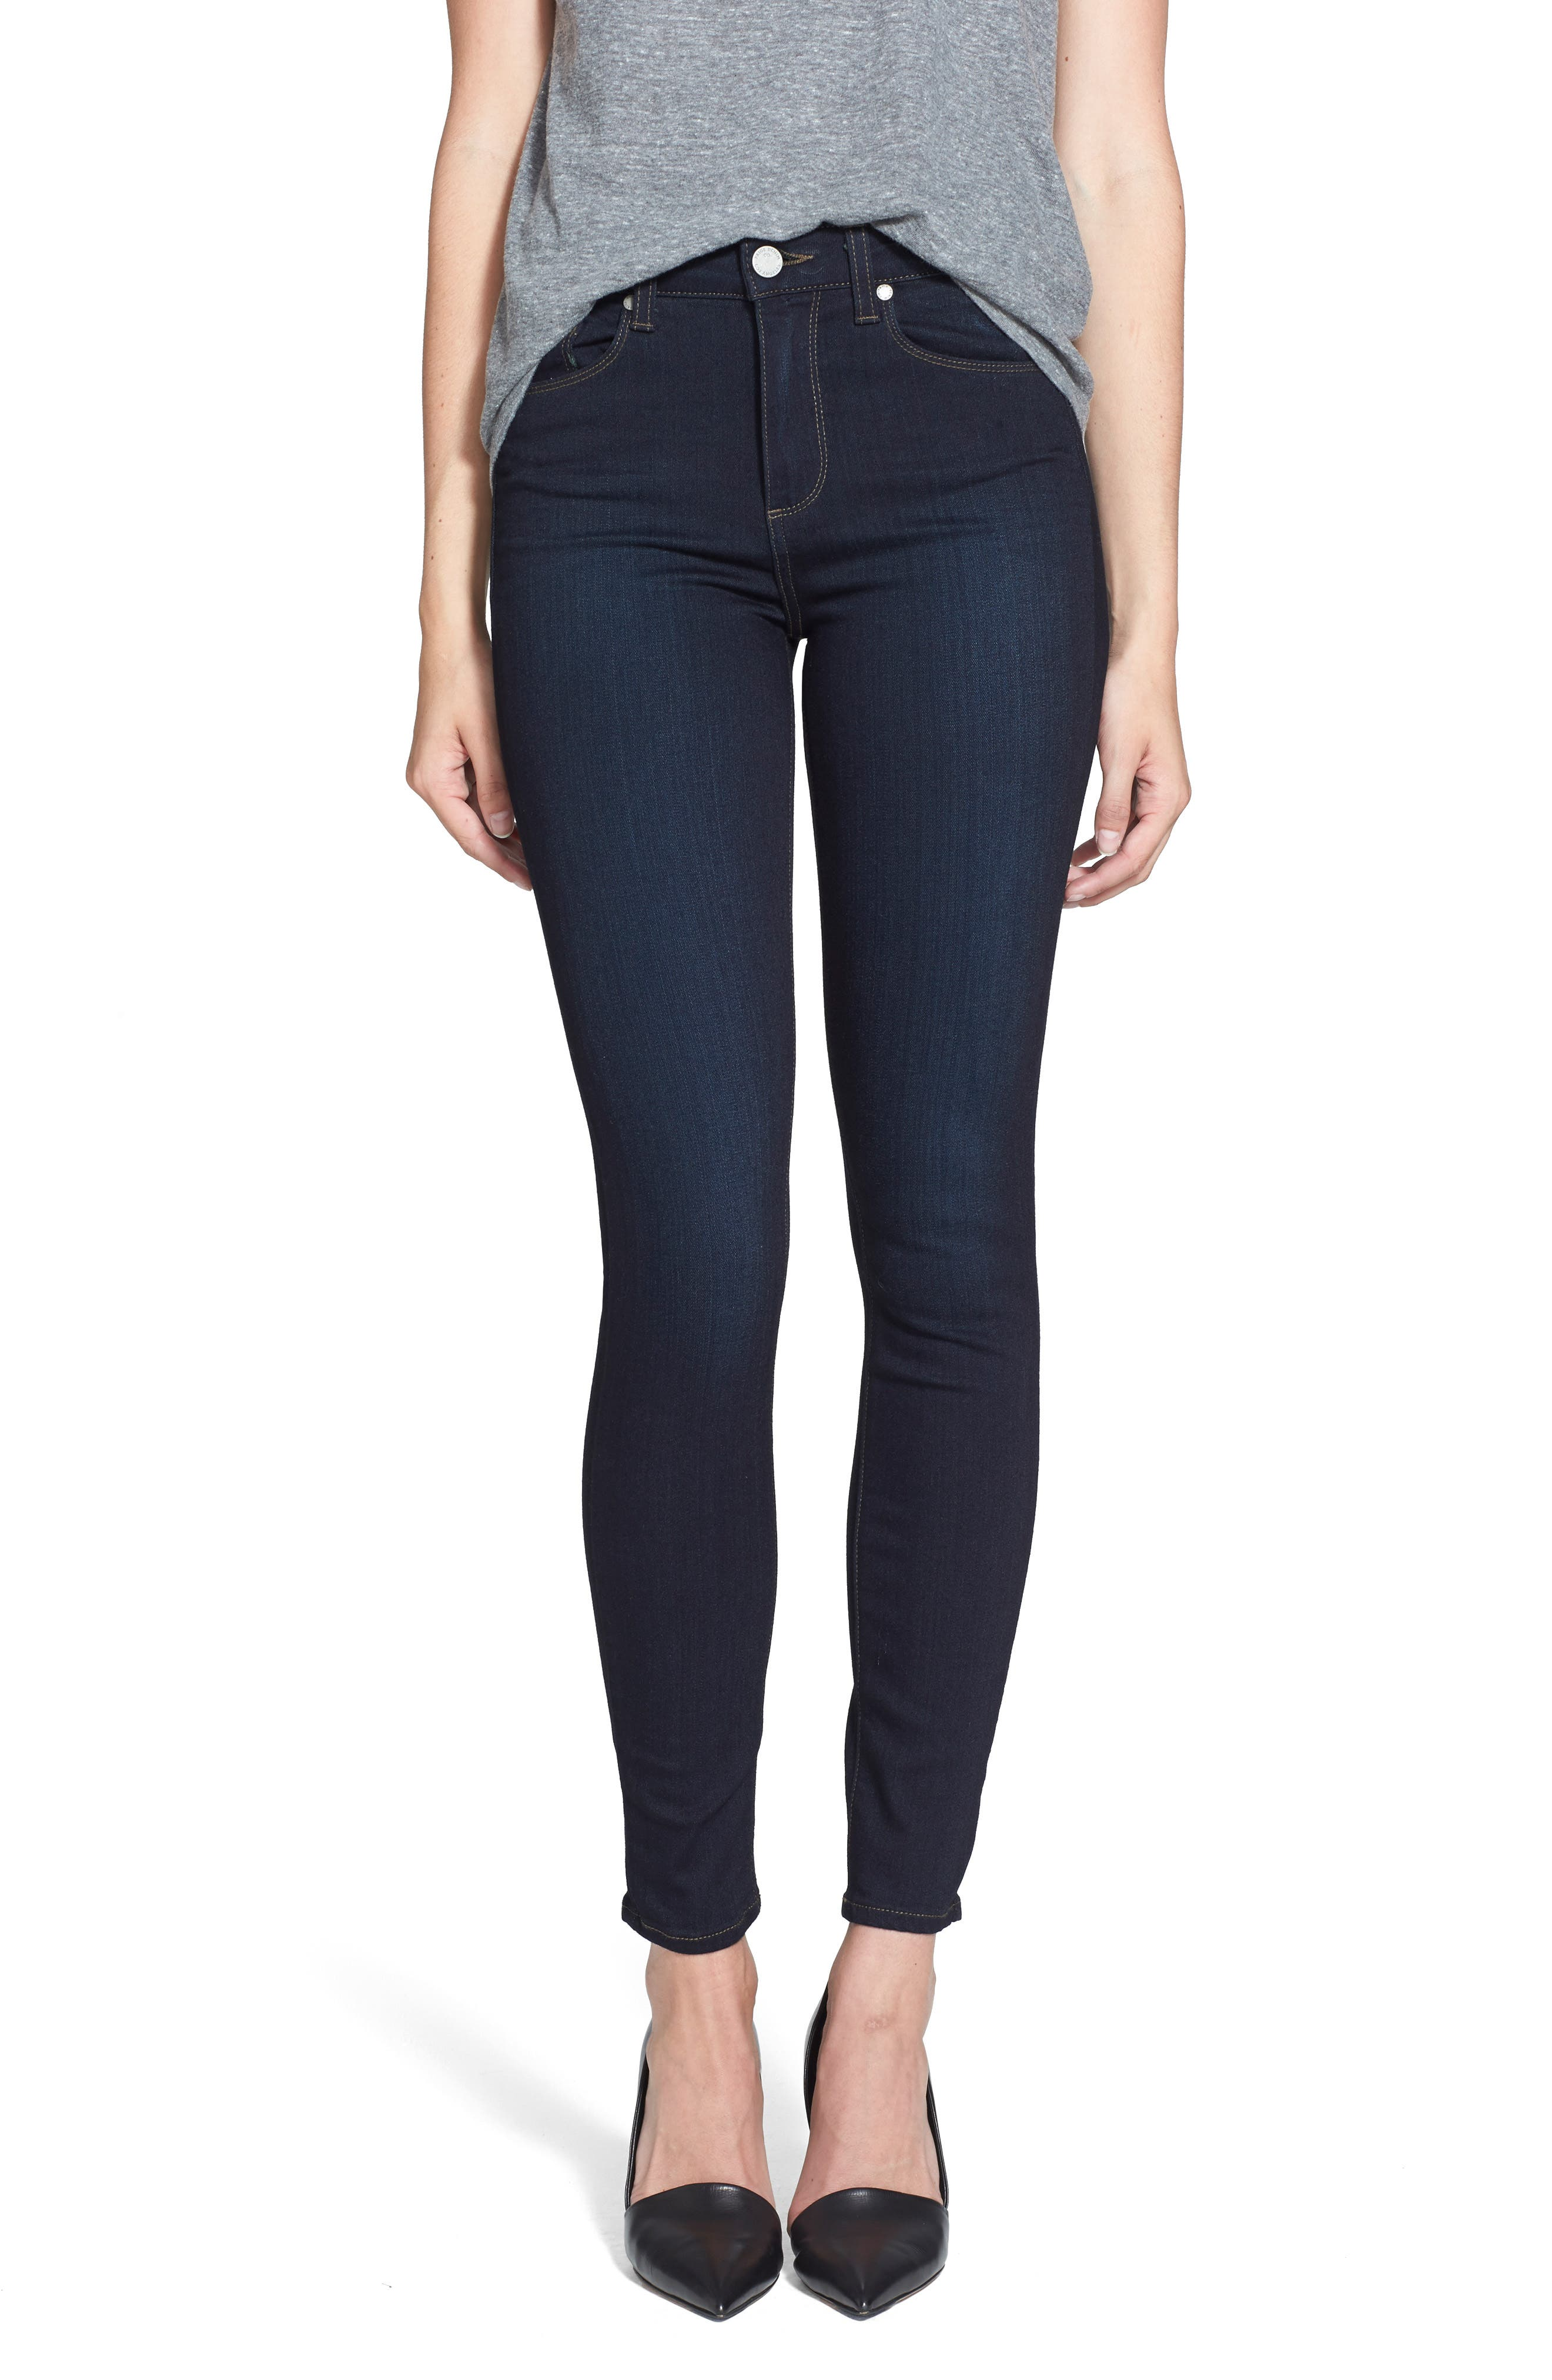 PAIGE, Transcend - Hoxton High Waist Ultra Skinny Jeans, Alternate thumbnail 2, color, MONA